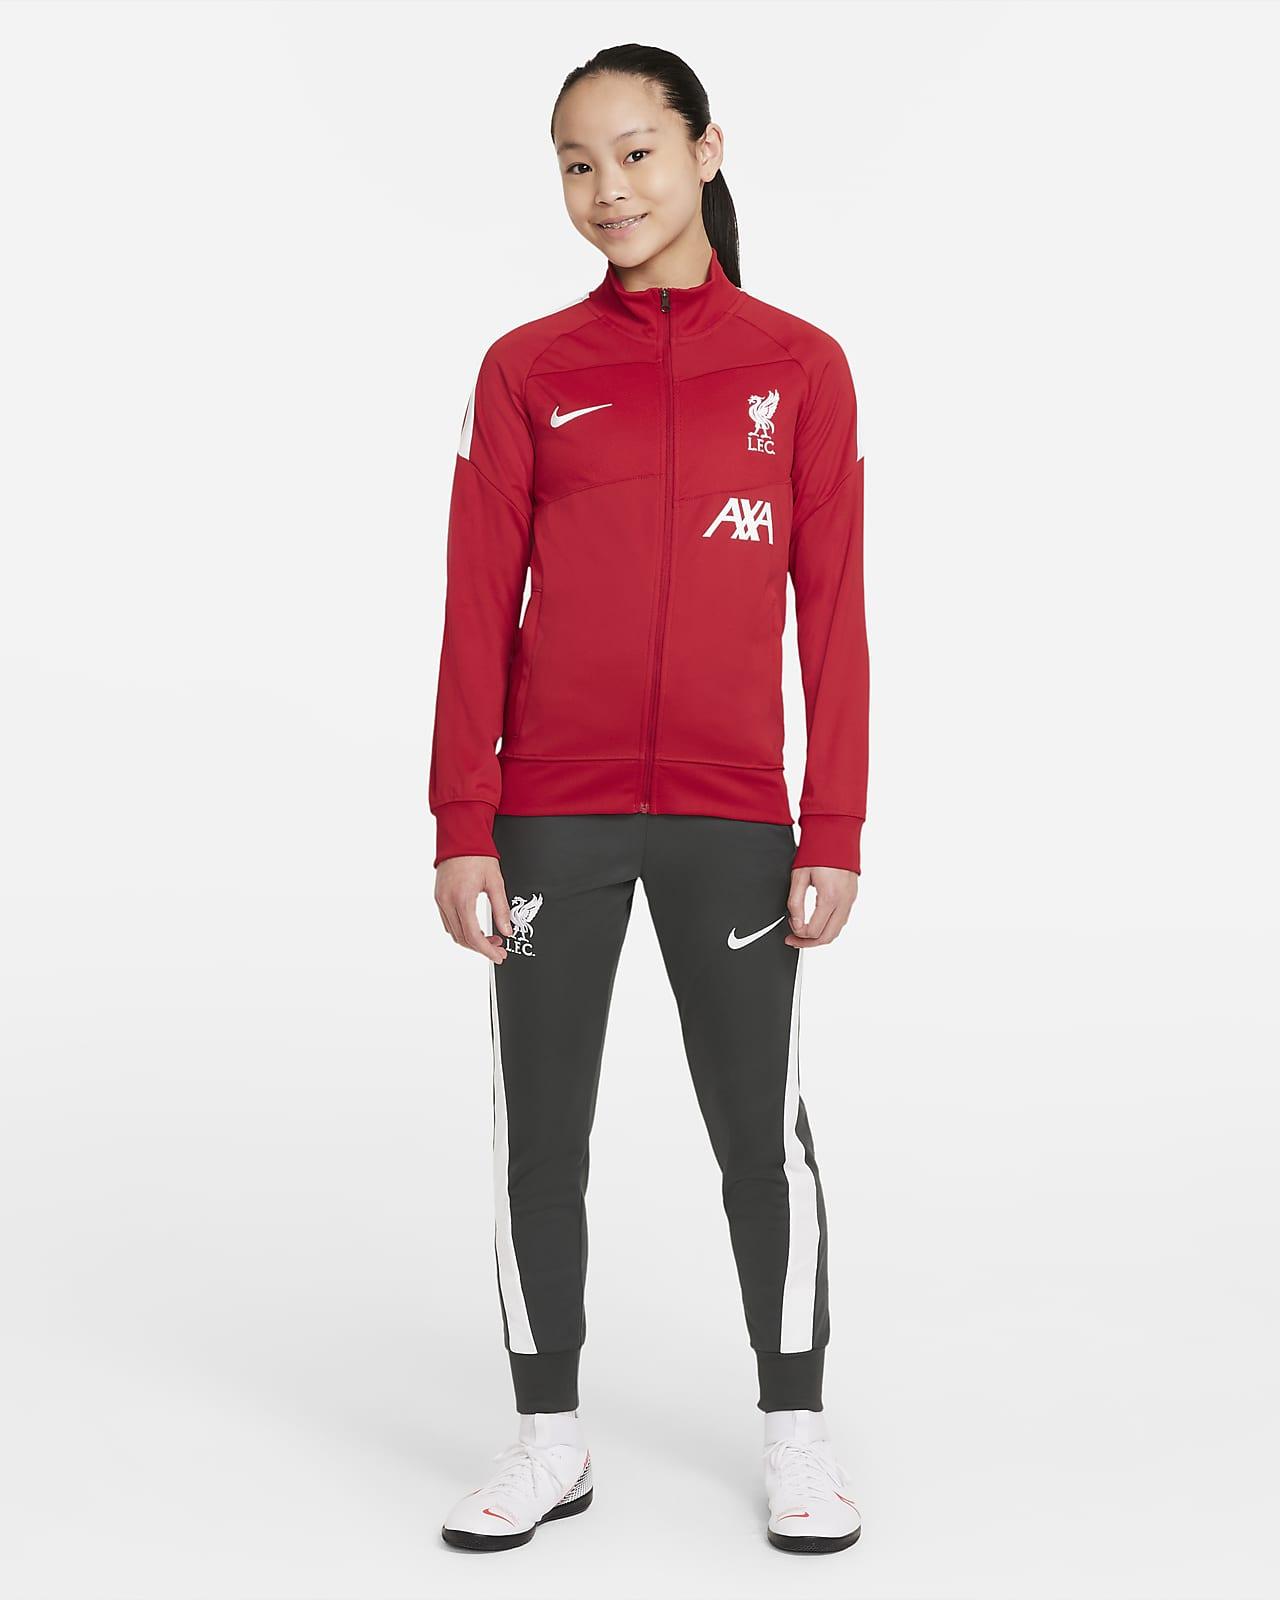 Liverpool F.C. Academy Pro Older Kids' Nike Dri-FIT Football Tracksuit